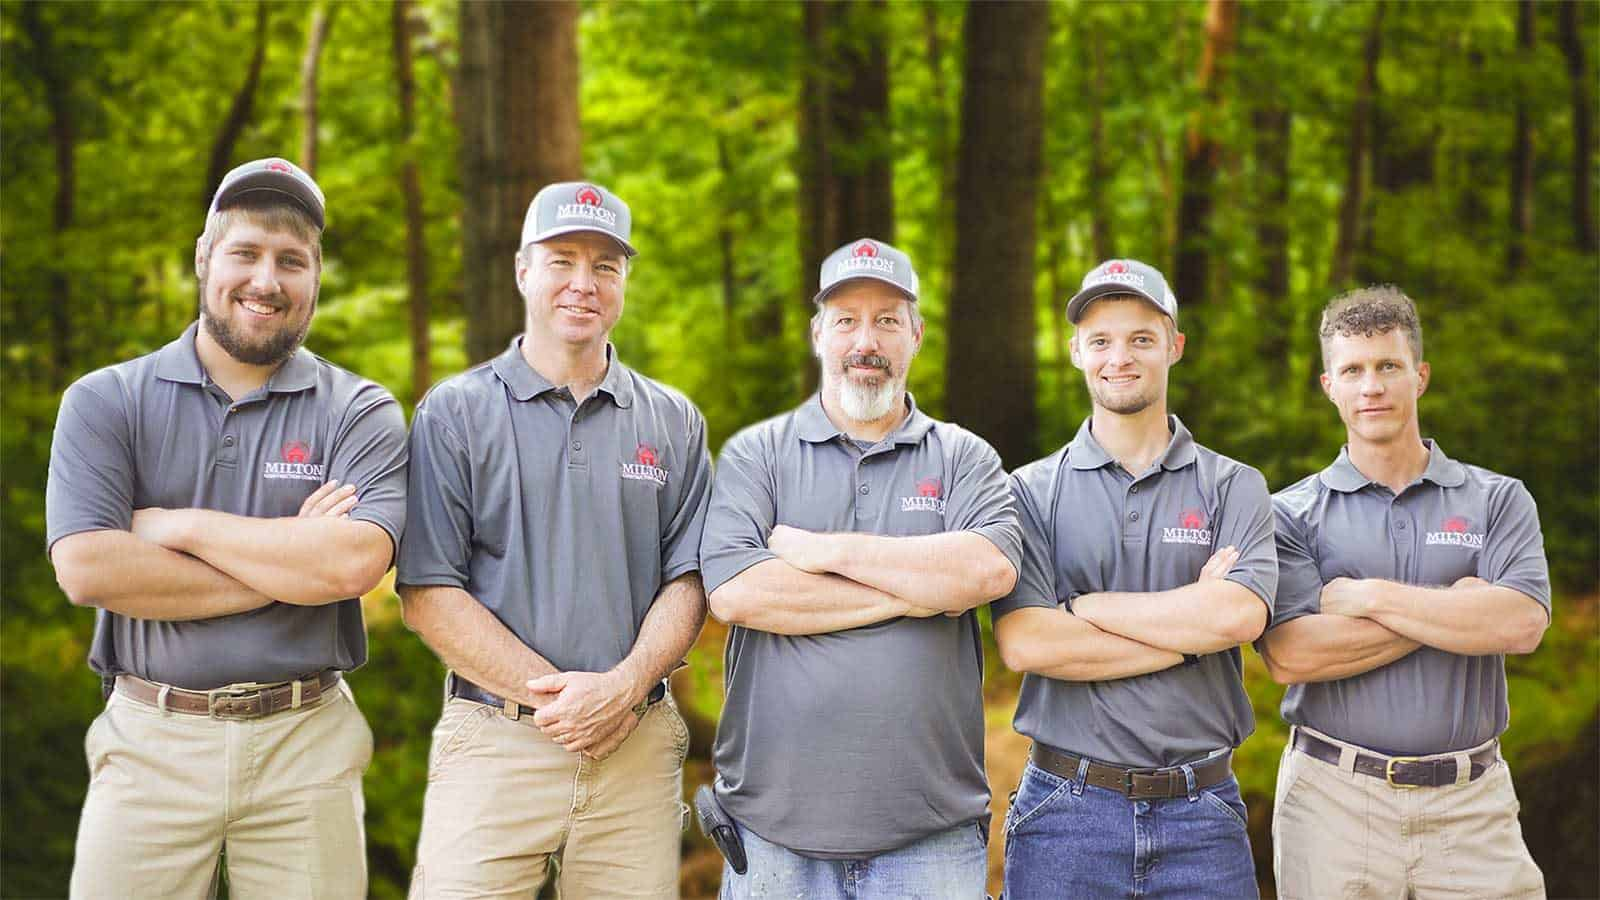 Milton Construction Team